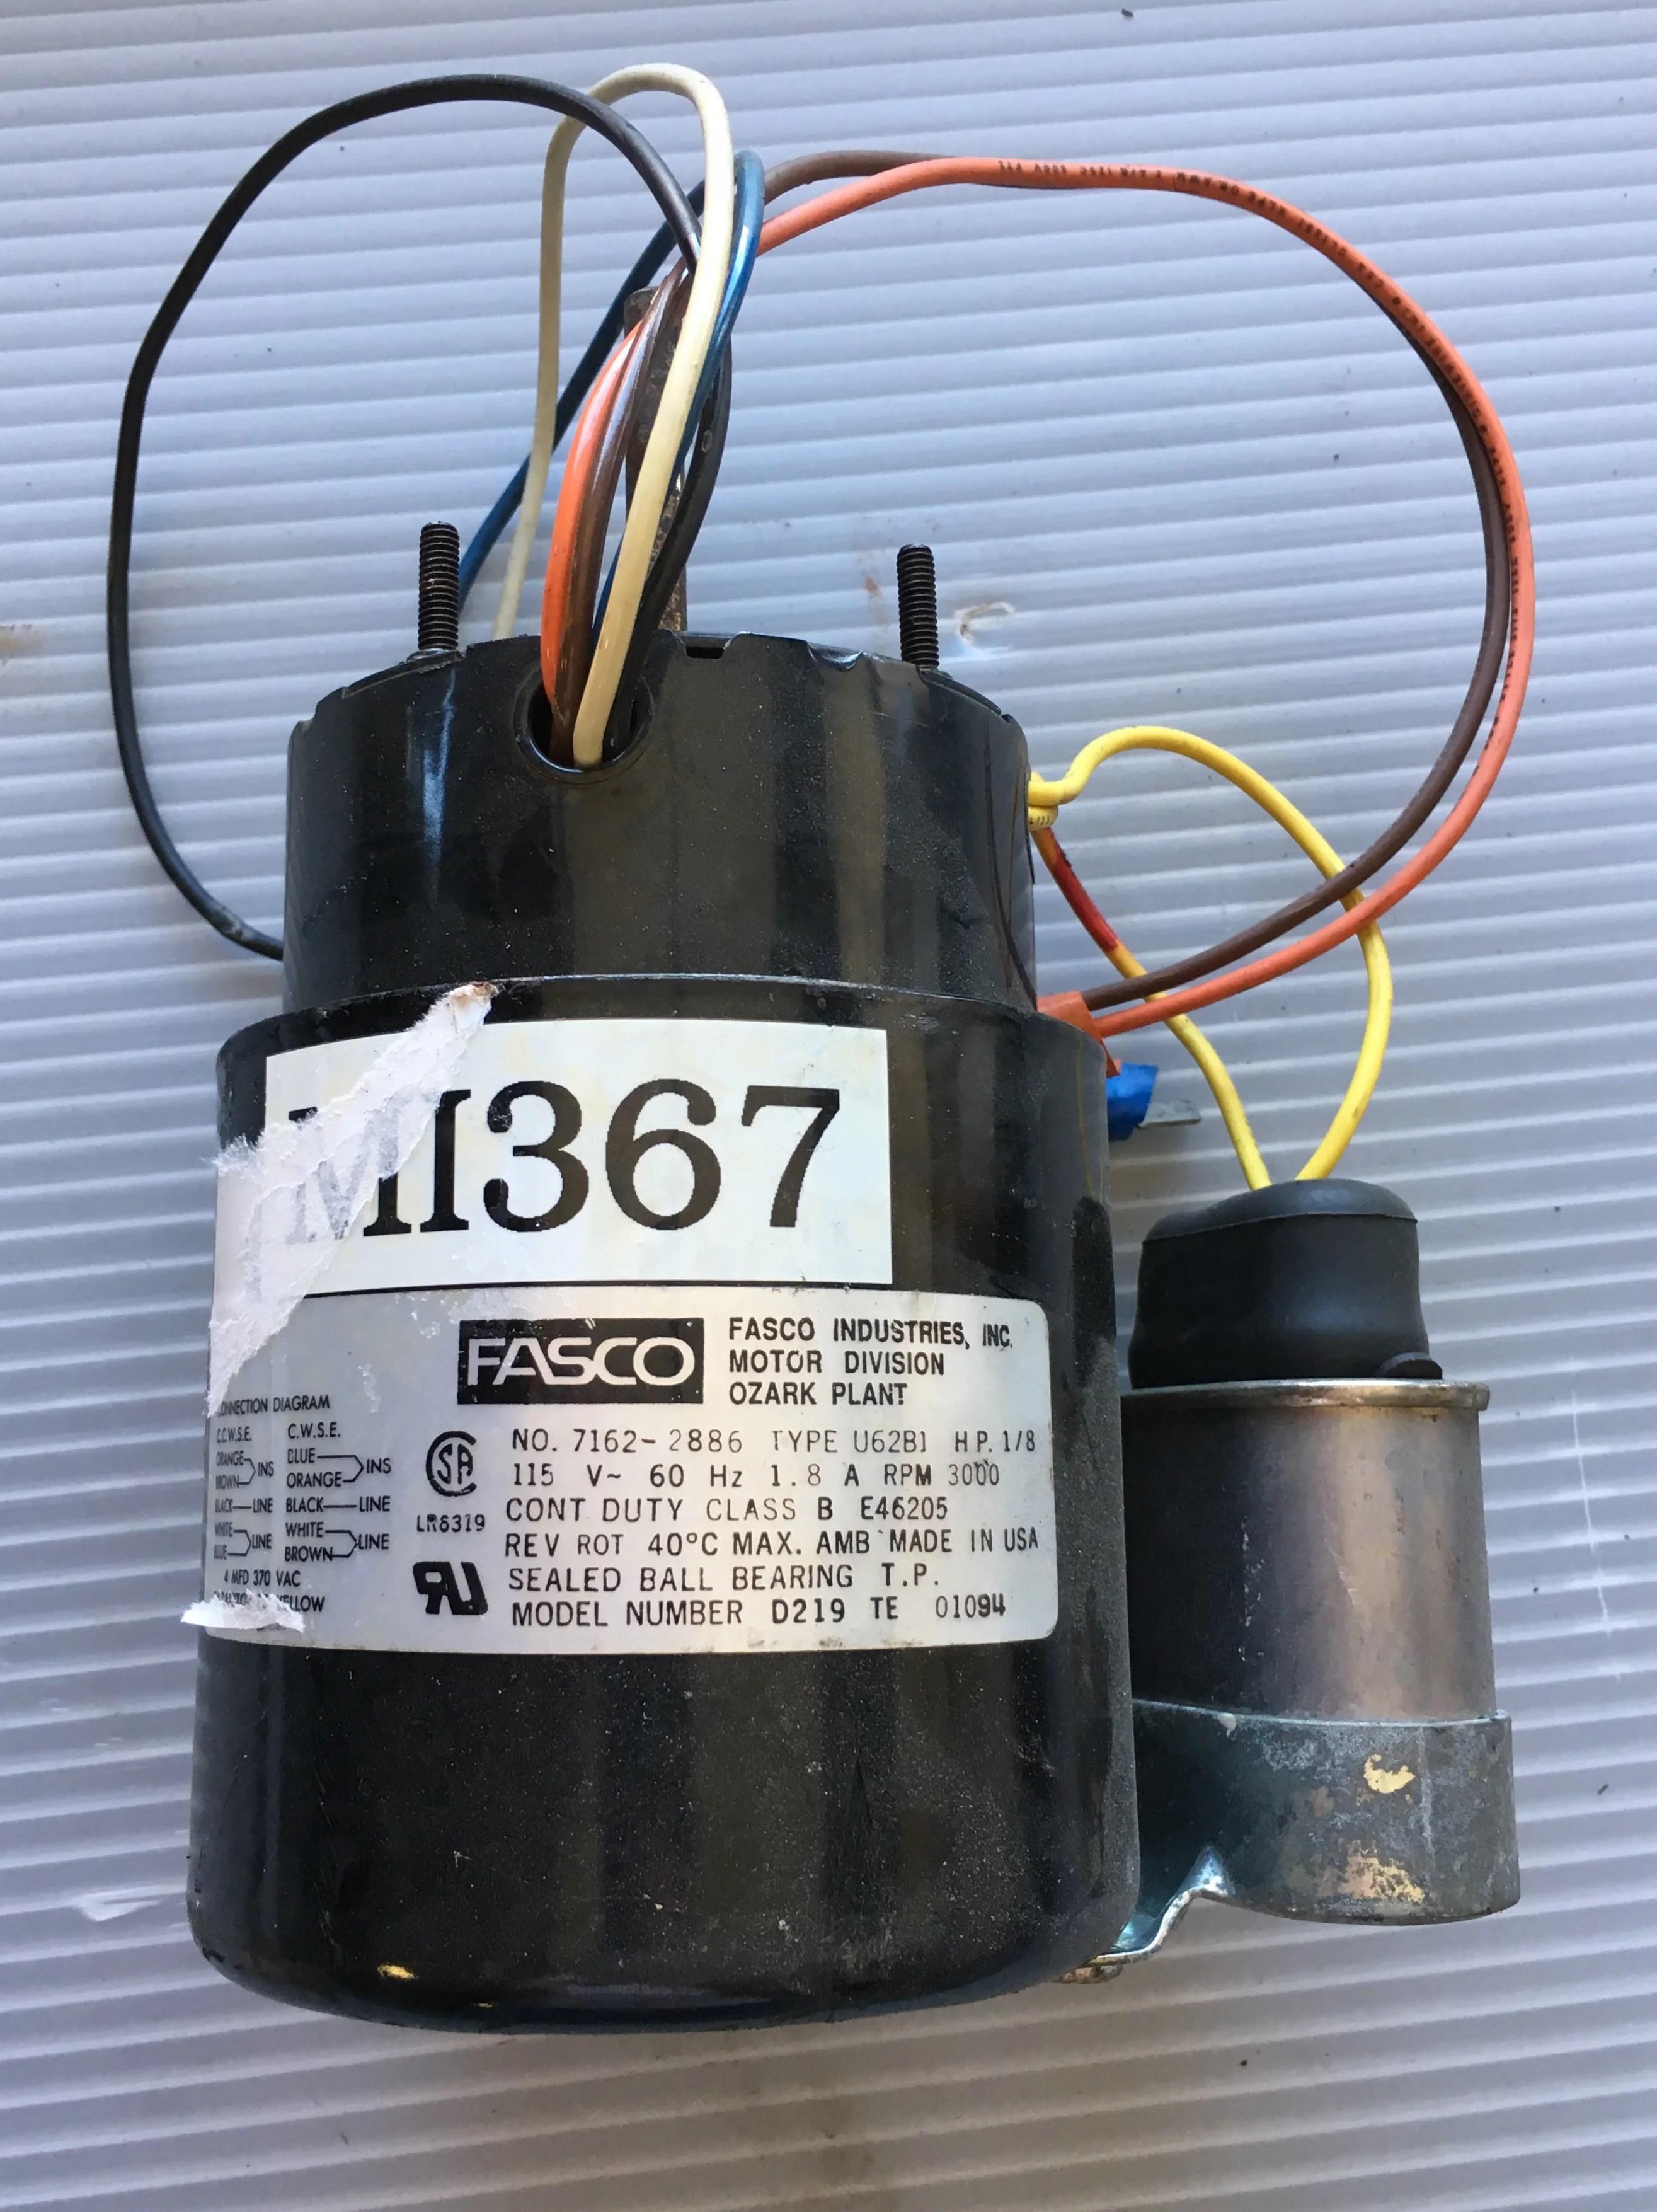 medium resolution of fasco motor u62b1 1 8 hp 3000 rpm 115 v metal logics inc fasco lr6319 motor fasco type u62b1 wiring diagram